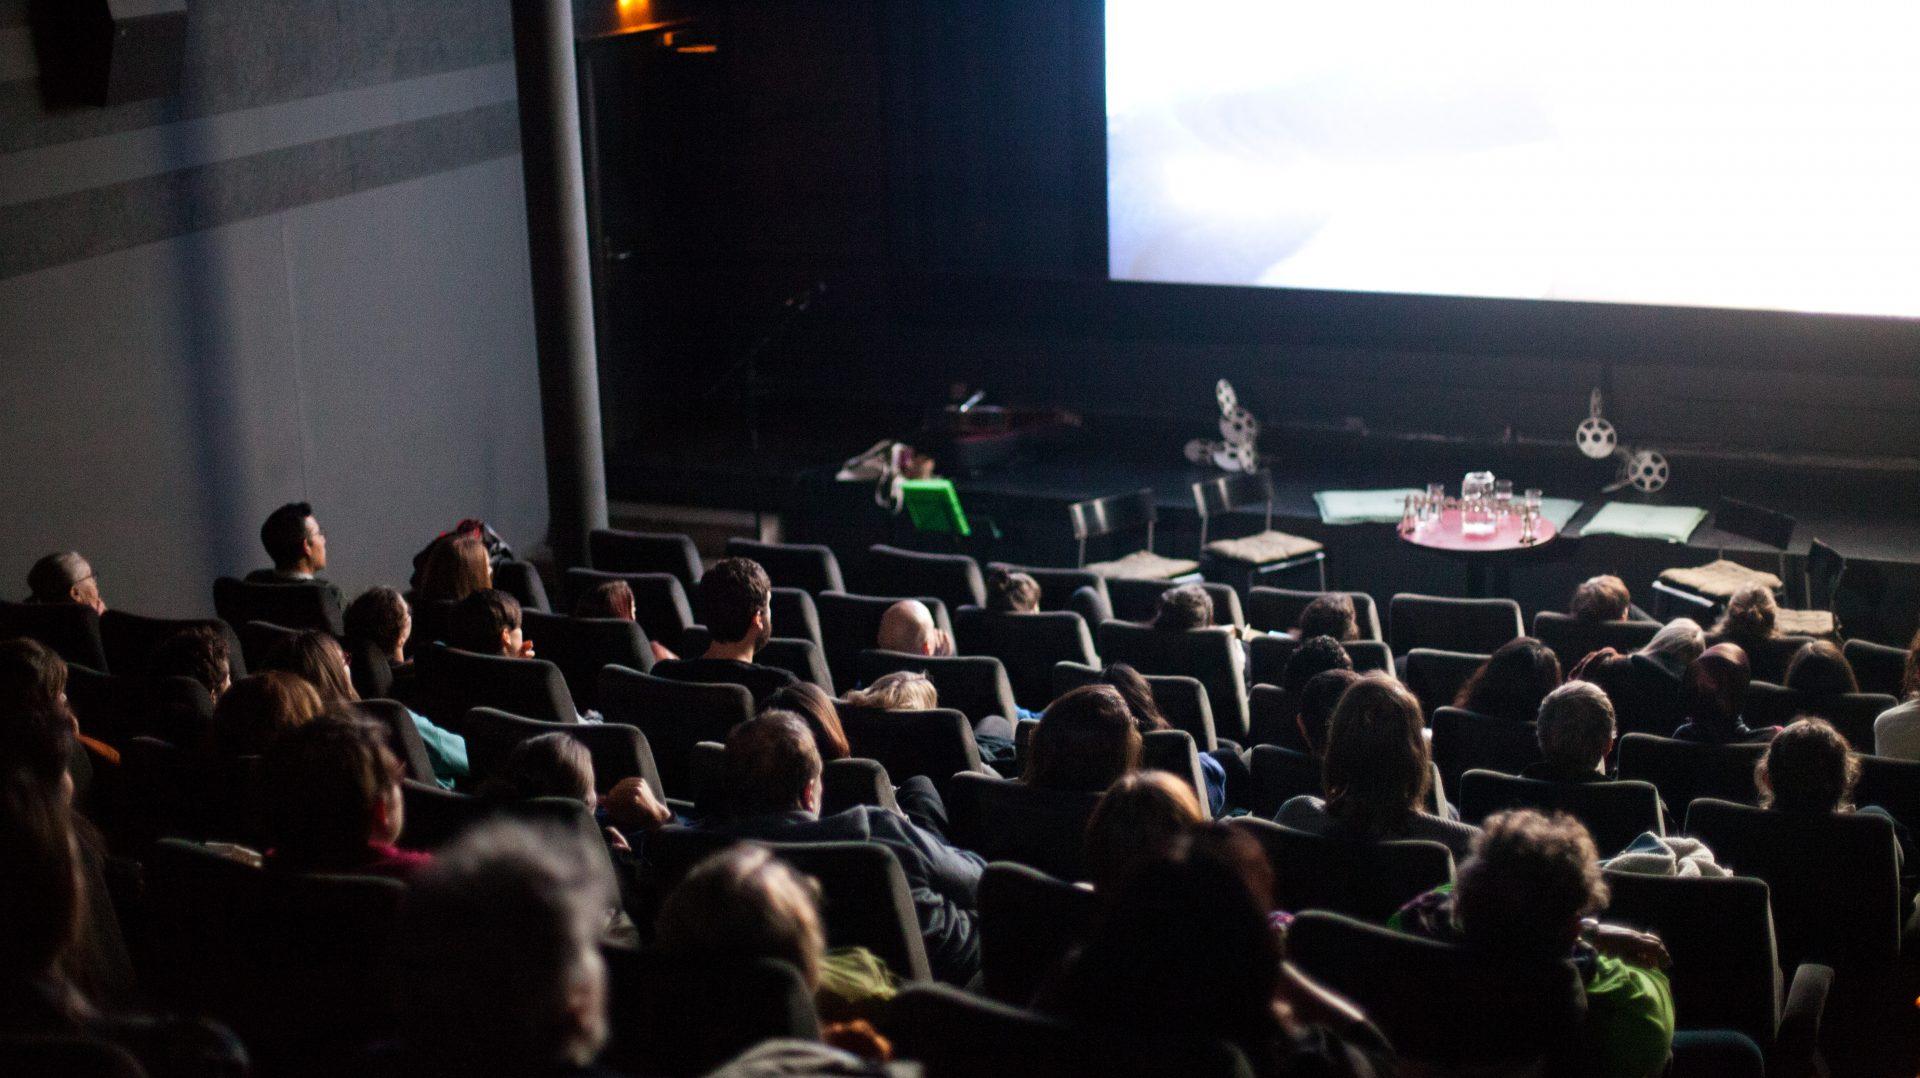 Inncontro Film Festival